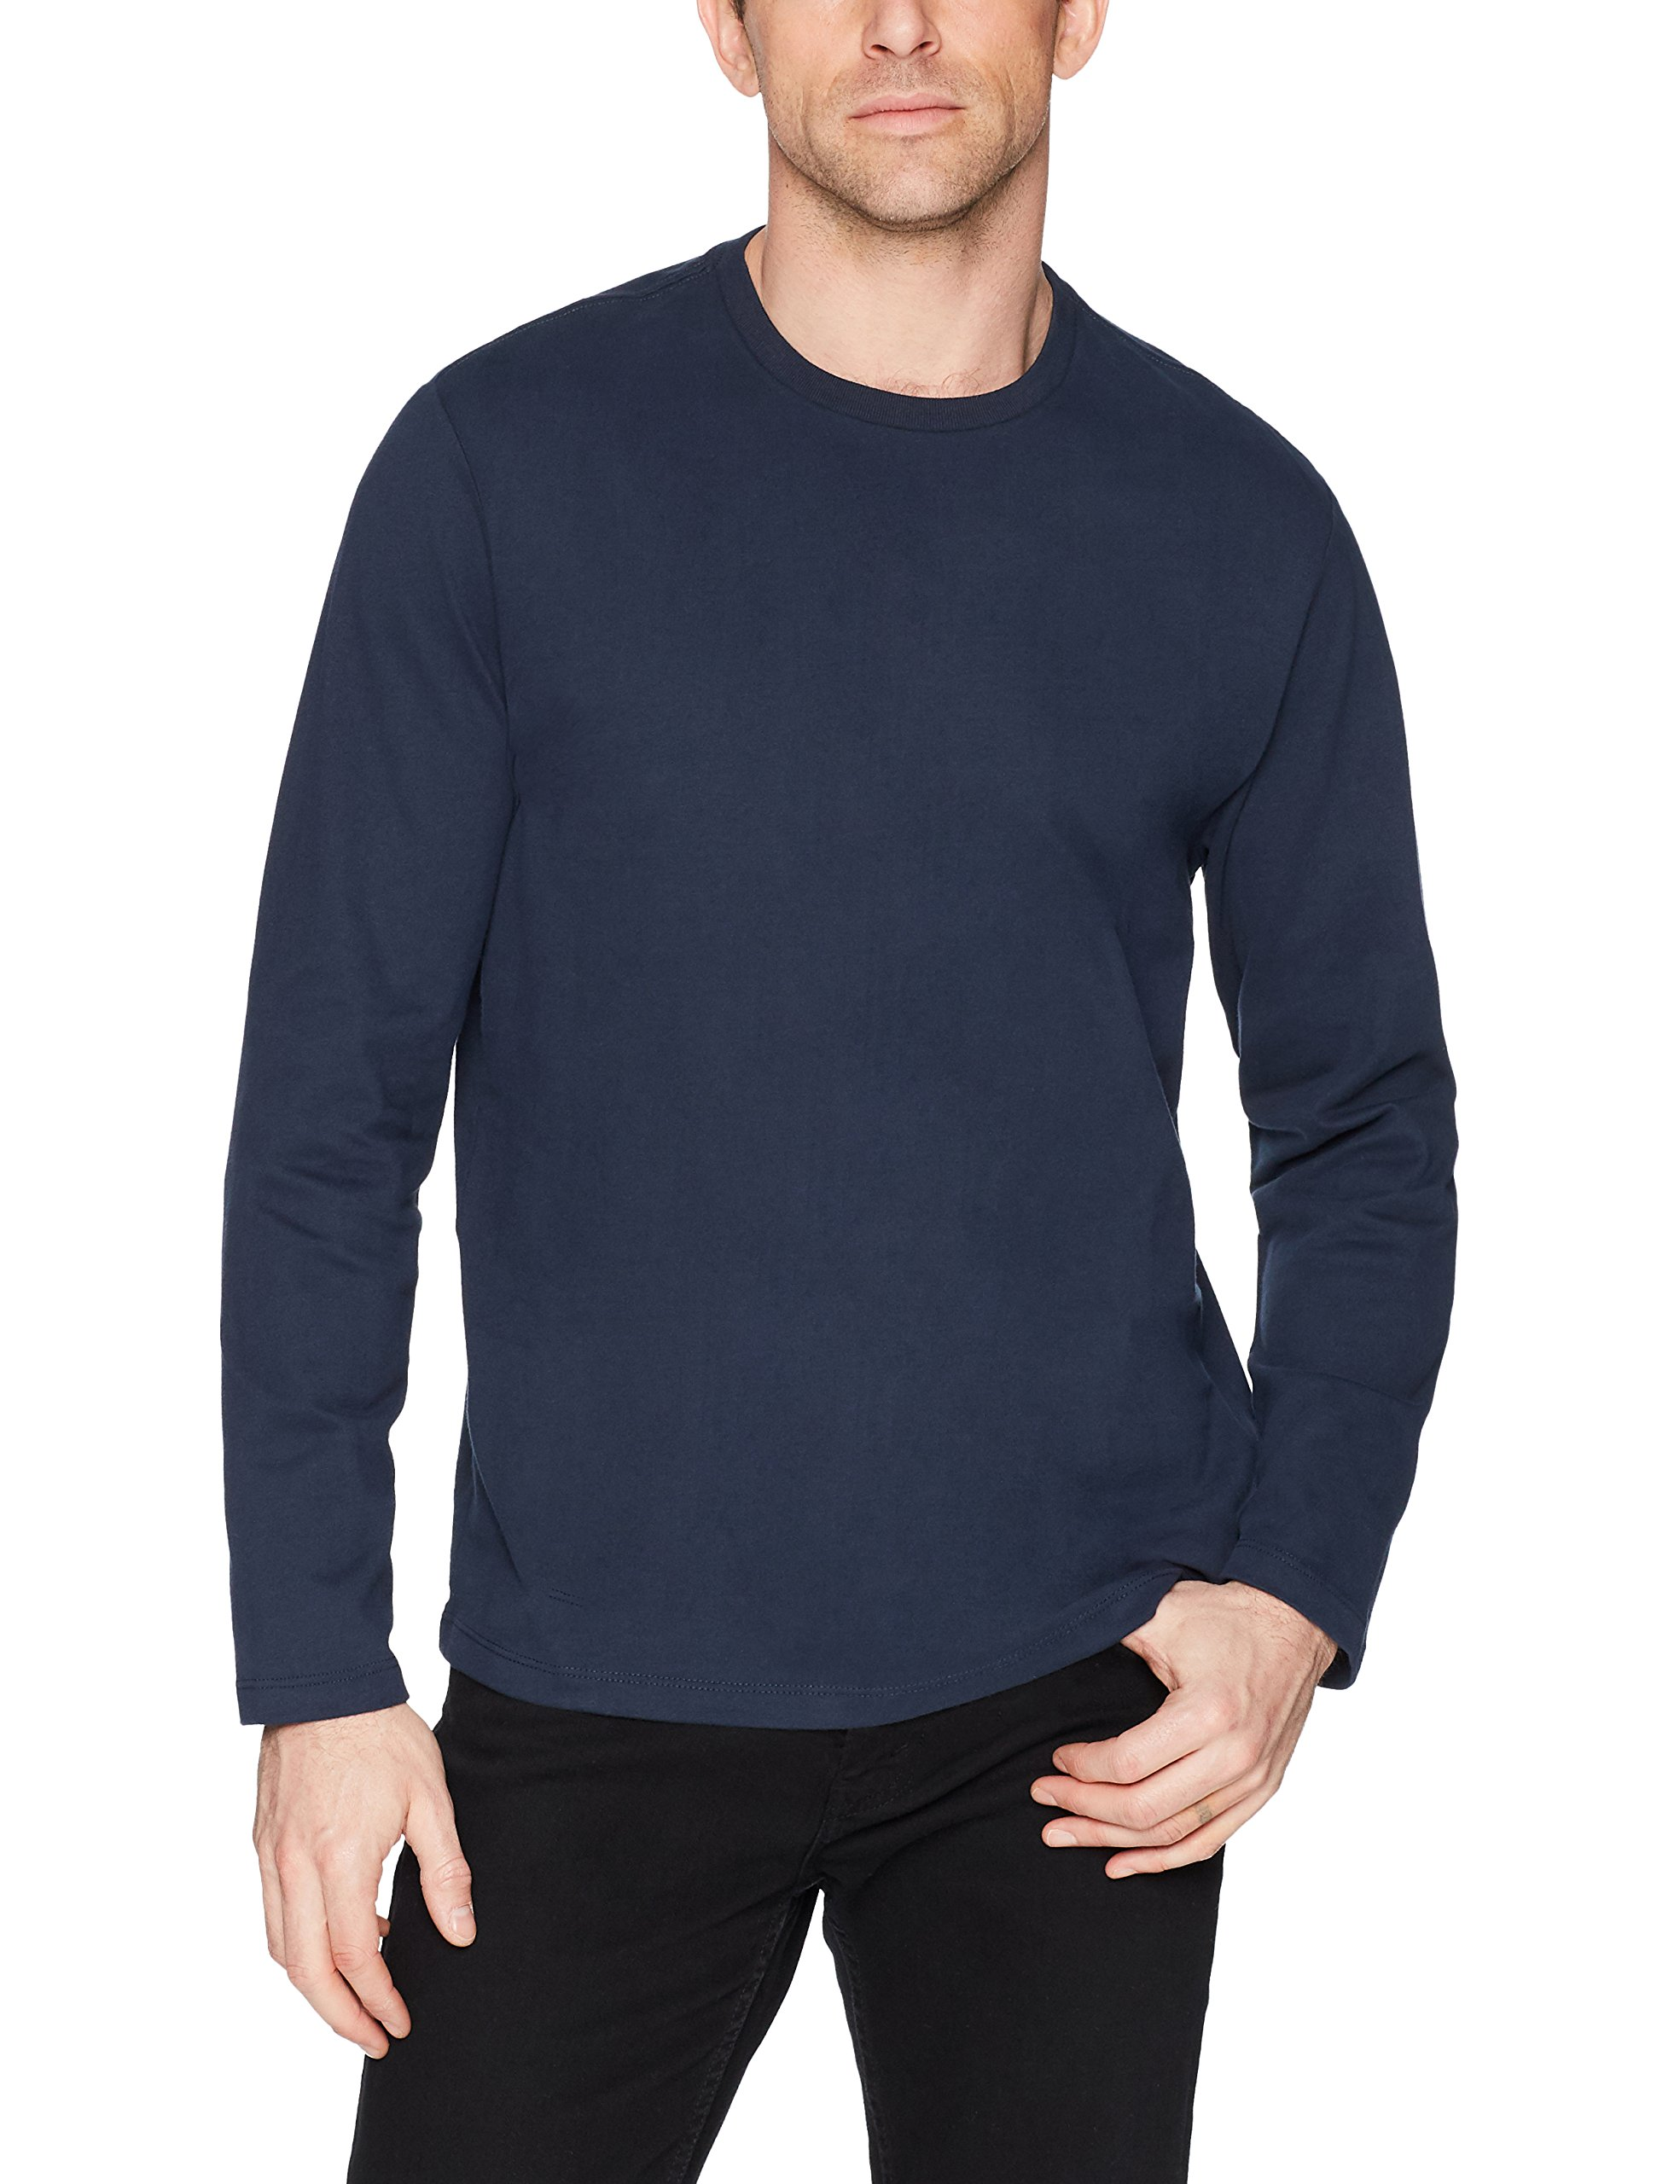 Amazon Essentials Men's Regular-Fit Long-Sleeve T-Shirt, Navy, Medium by Amazon Essentials (Image #3)